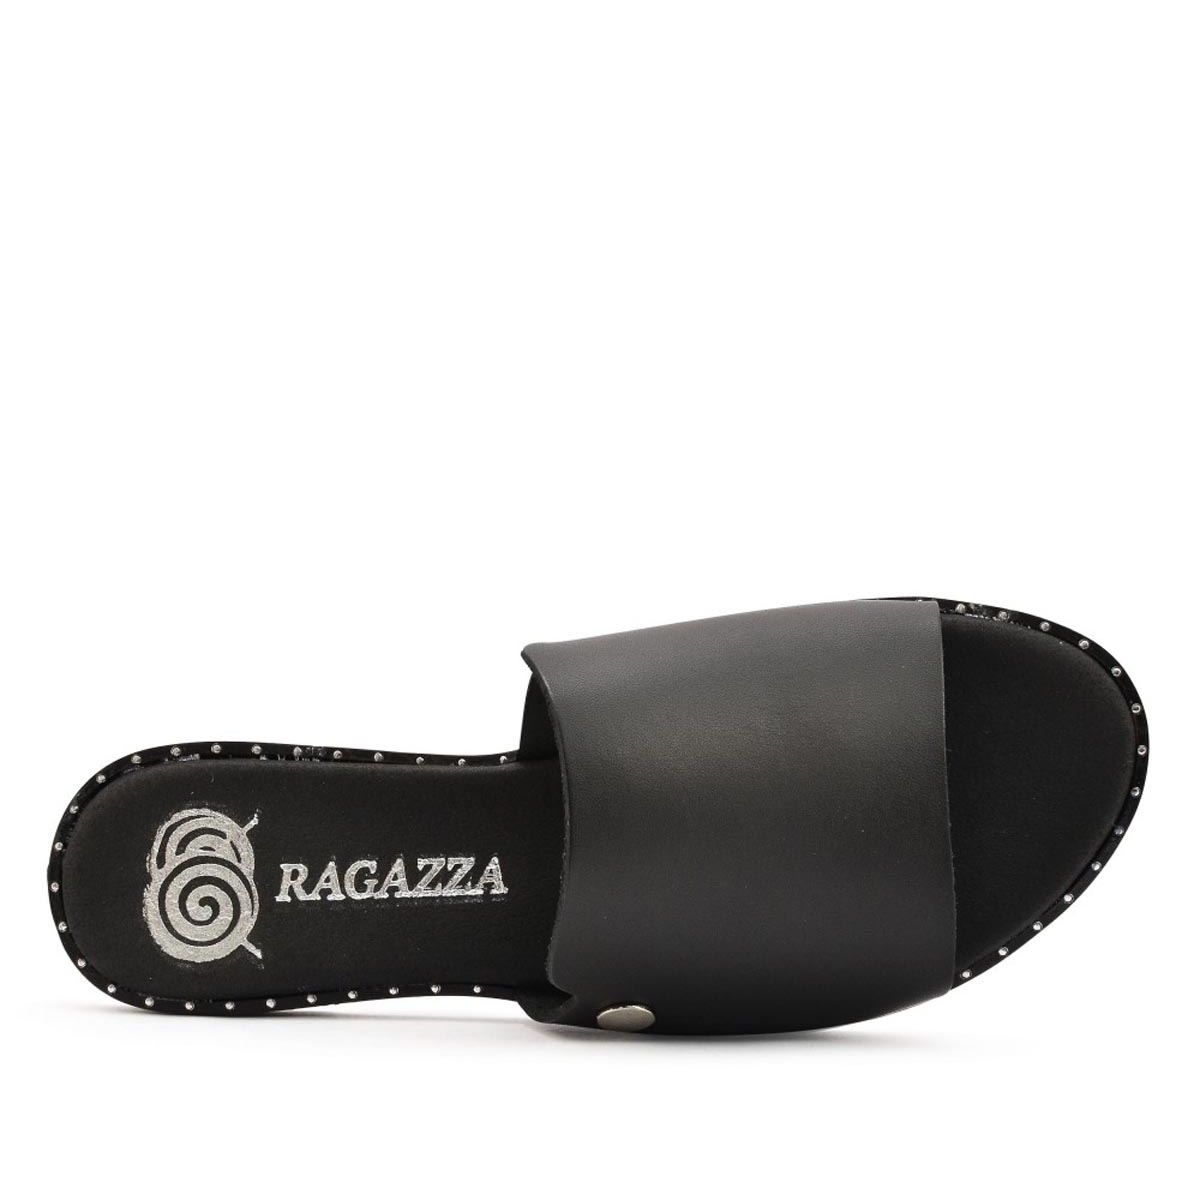 Ragazza Γυναικεία Σανδάλια 0470 Leather Black